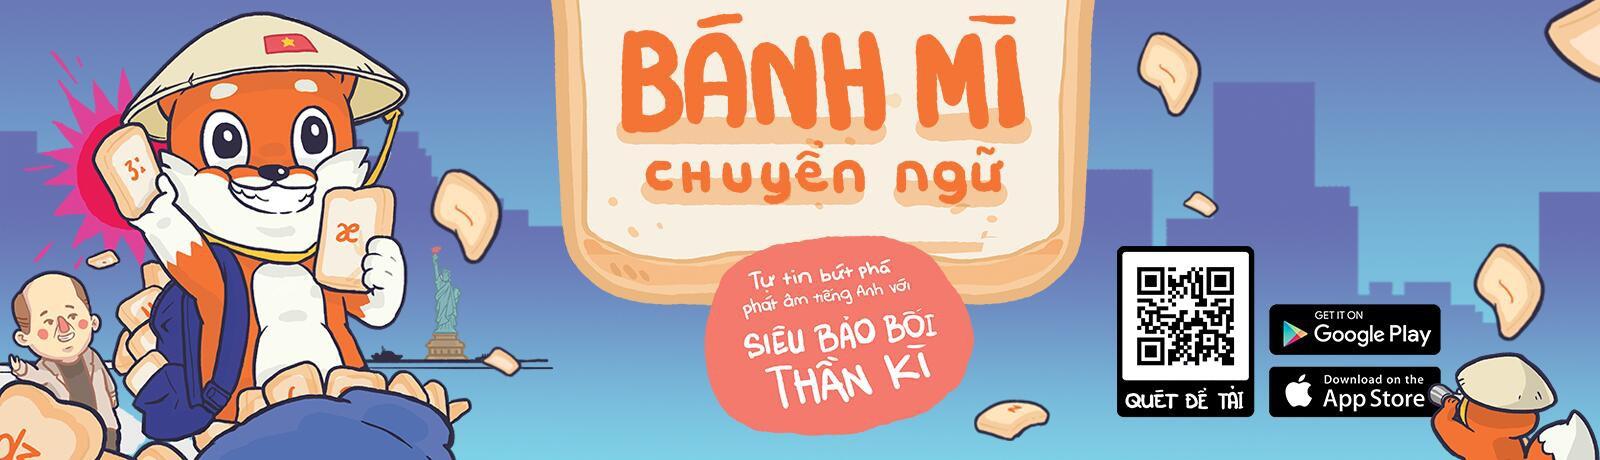 Banner Trang chủ